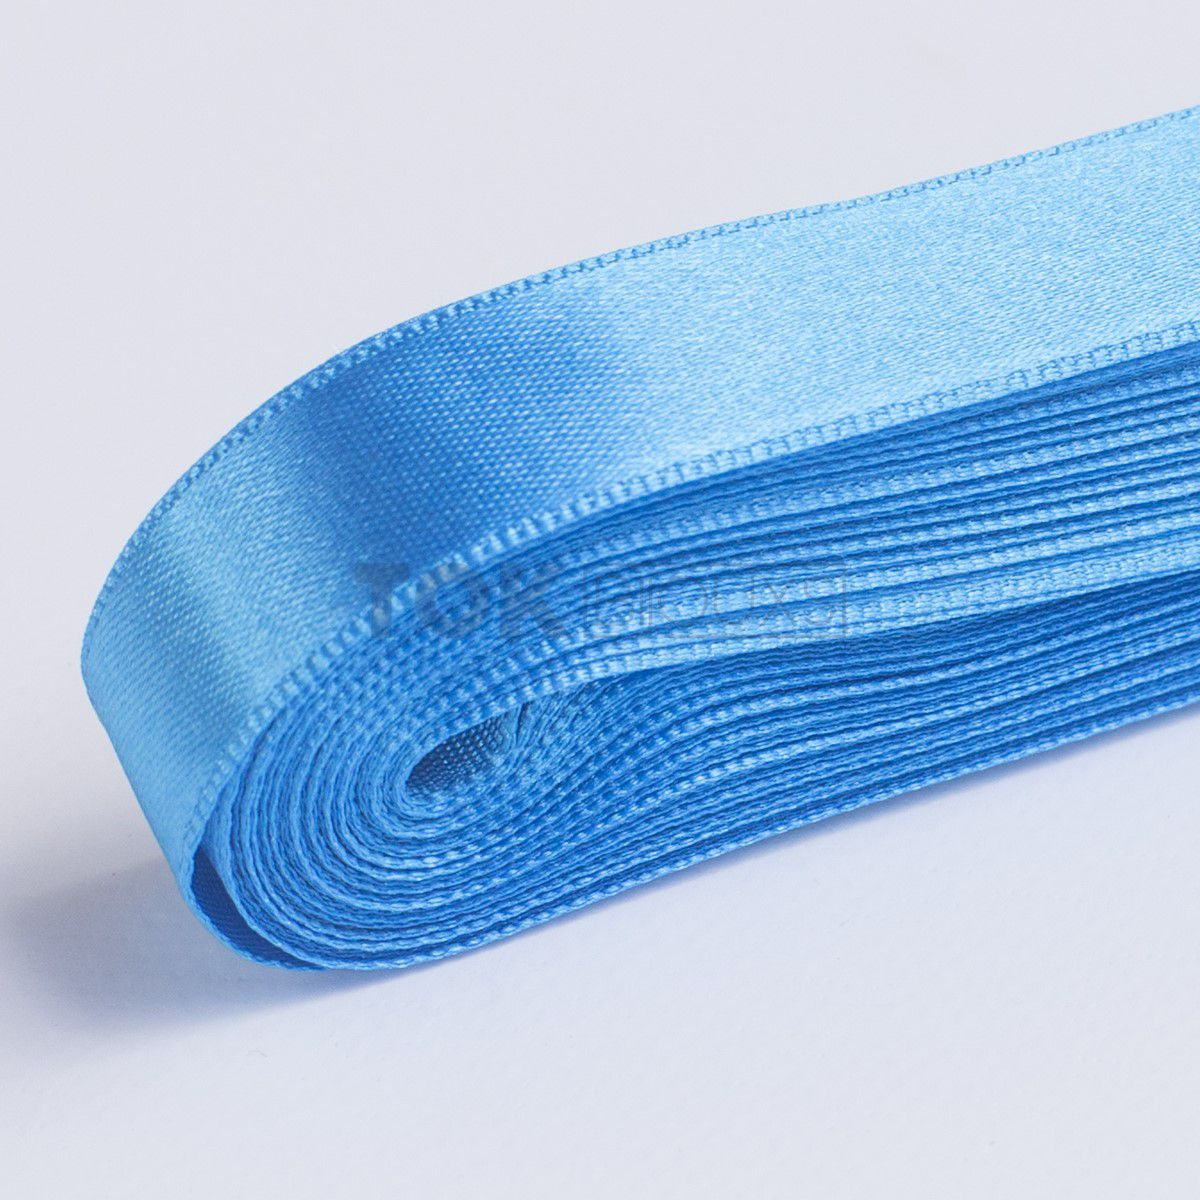 Fita Cetim N.5 - 22mm - 10 Metros - COR (21) Azul Turquesa